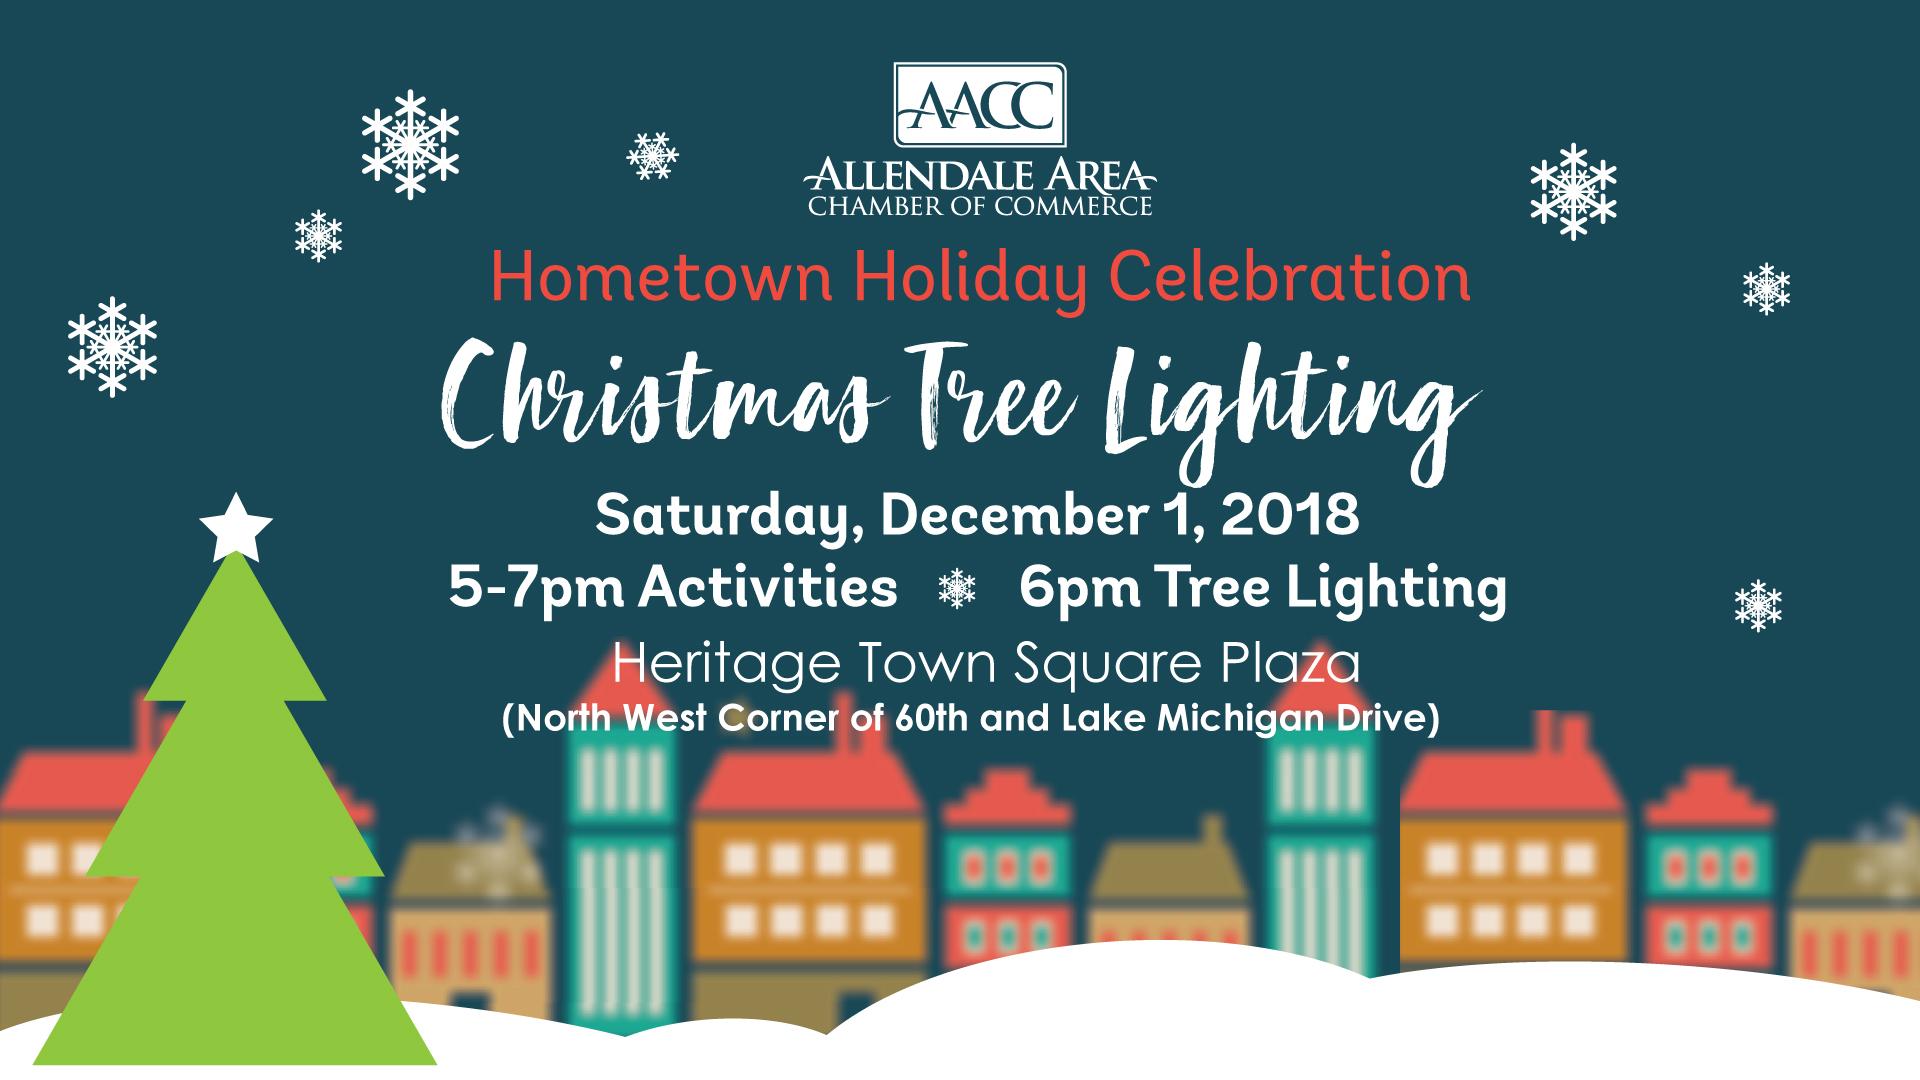 hometown holiday celebration